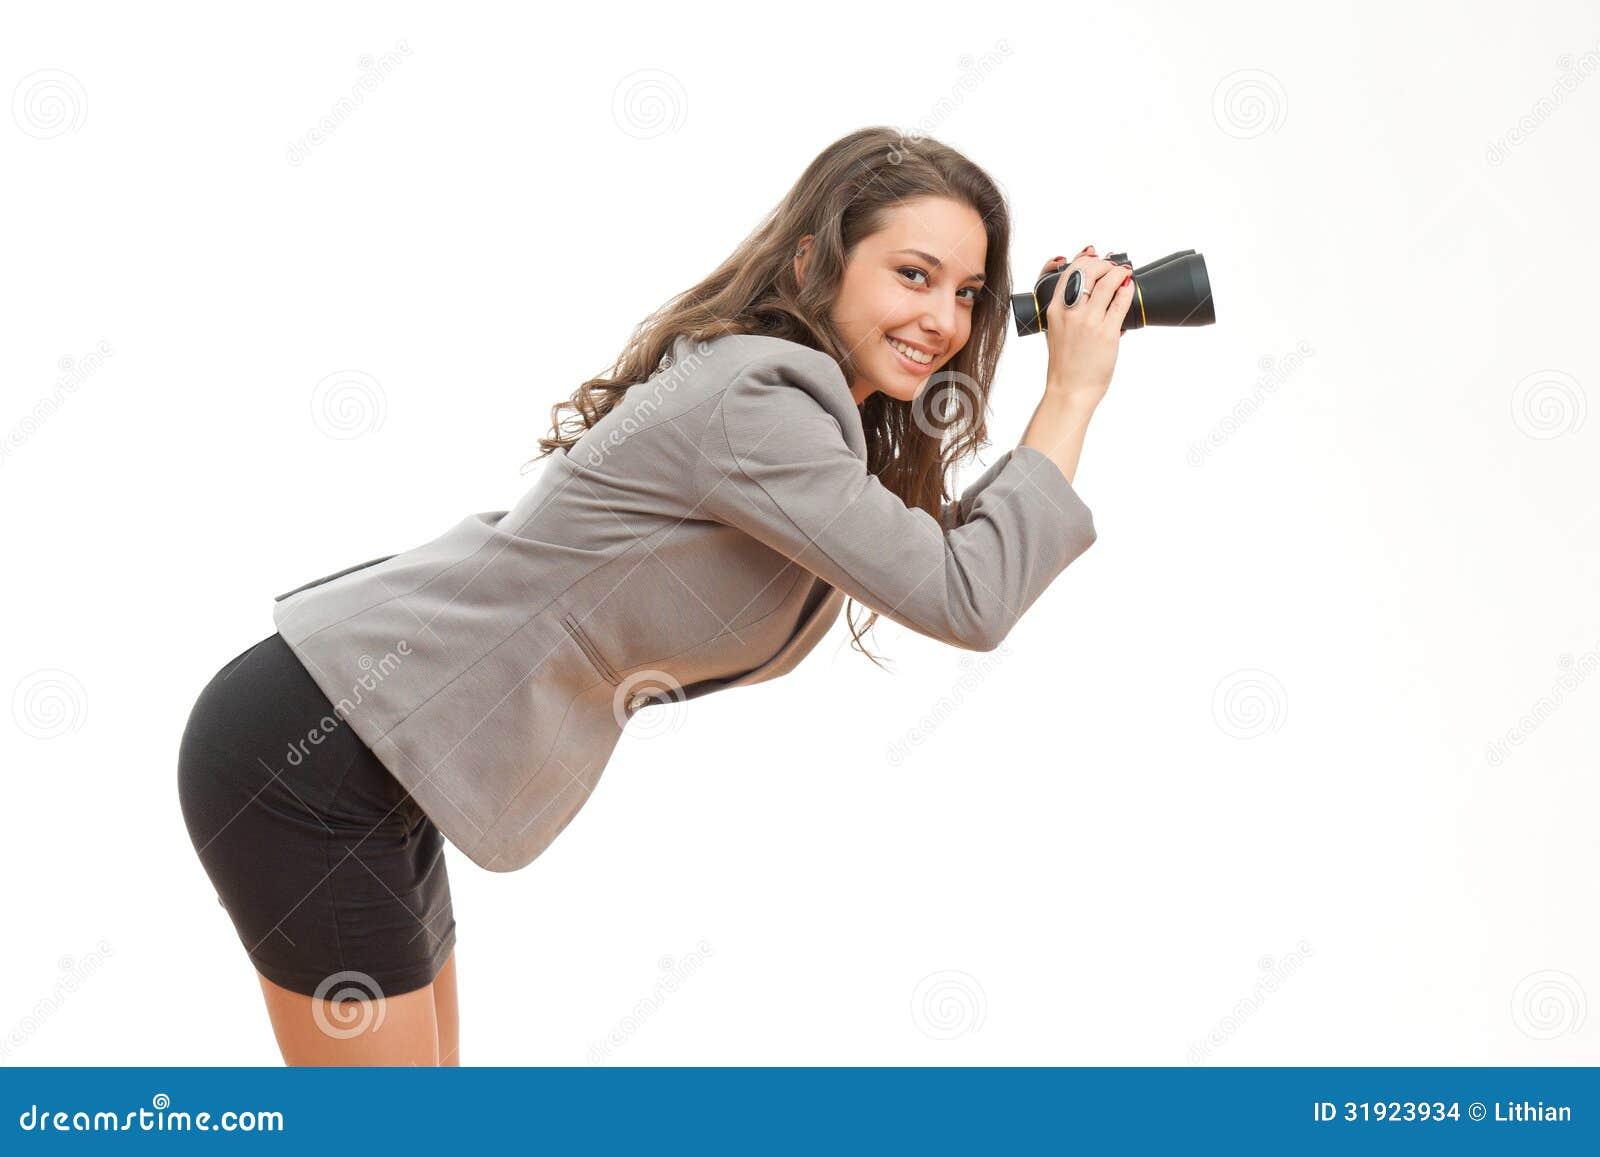 the jobseeker stock images image 31923934 the jobseeker